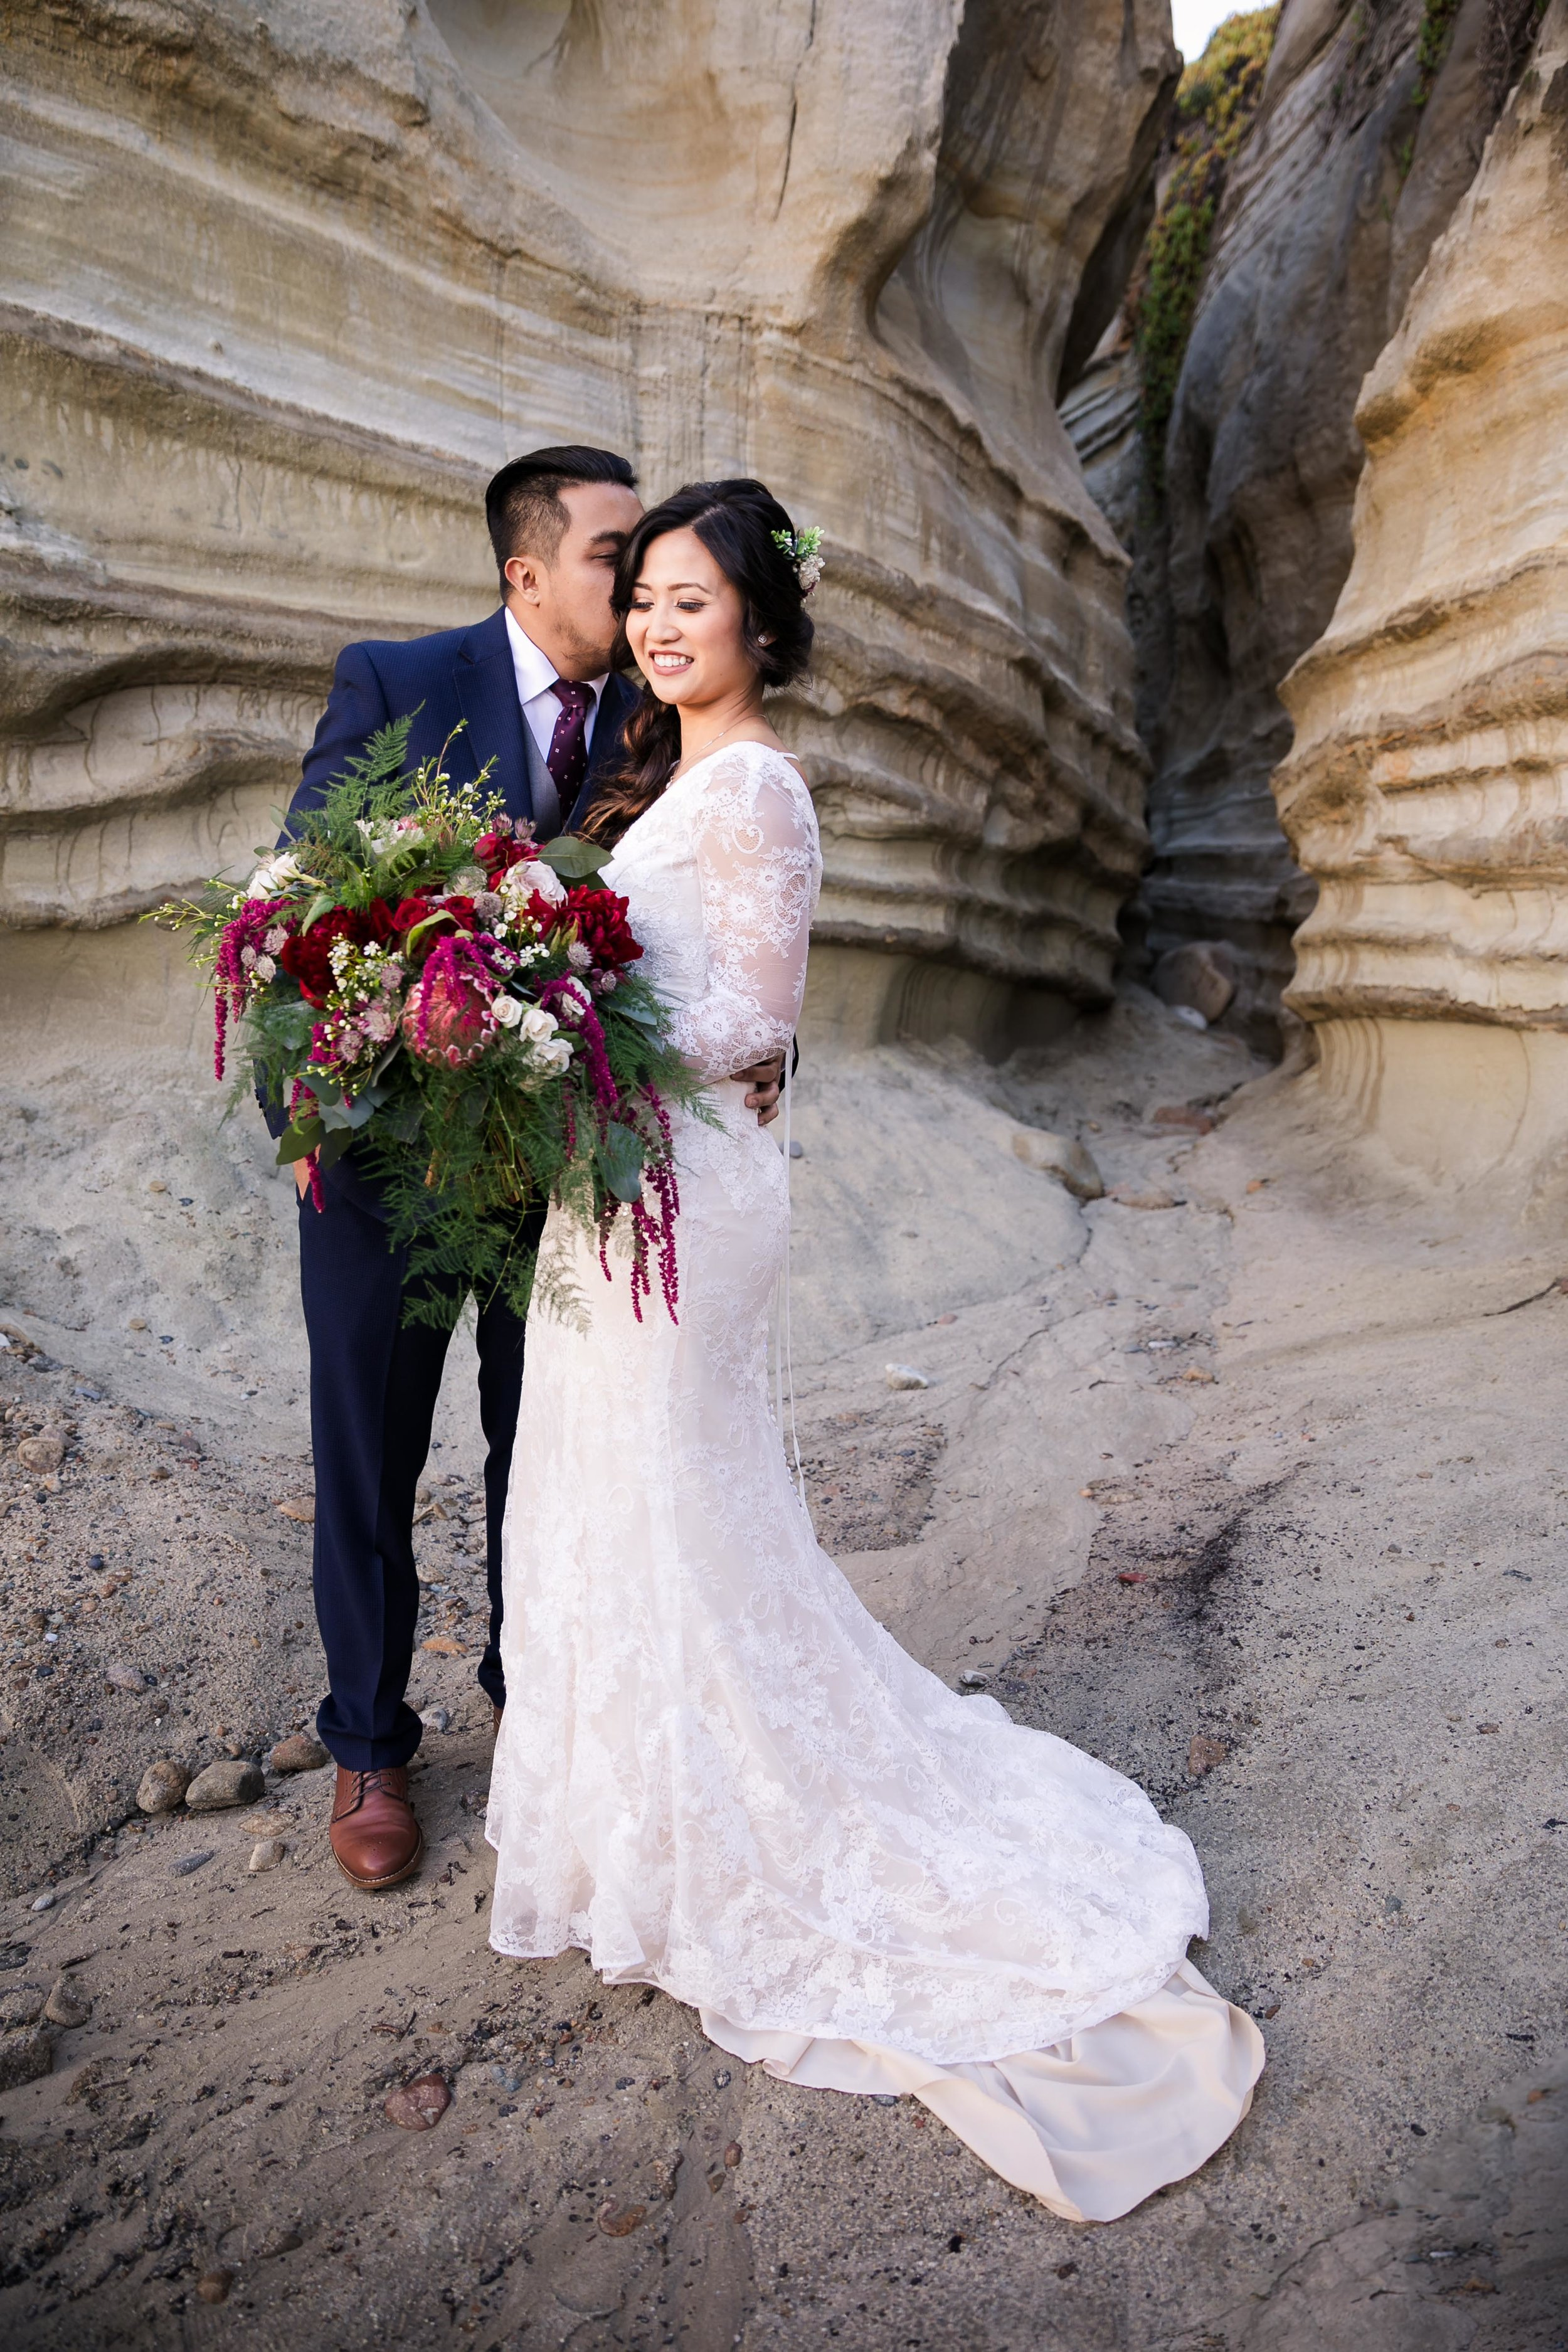 southern_california_wedding_joshuachun_photography-3.JPG